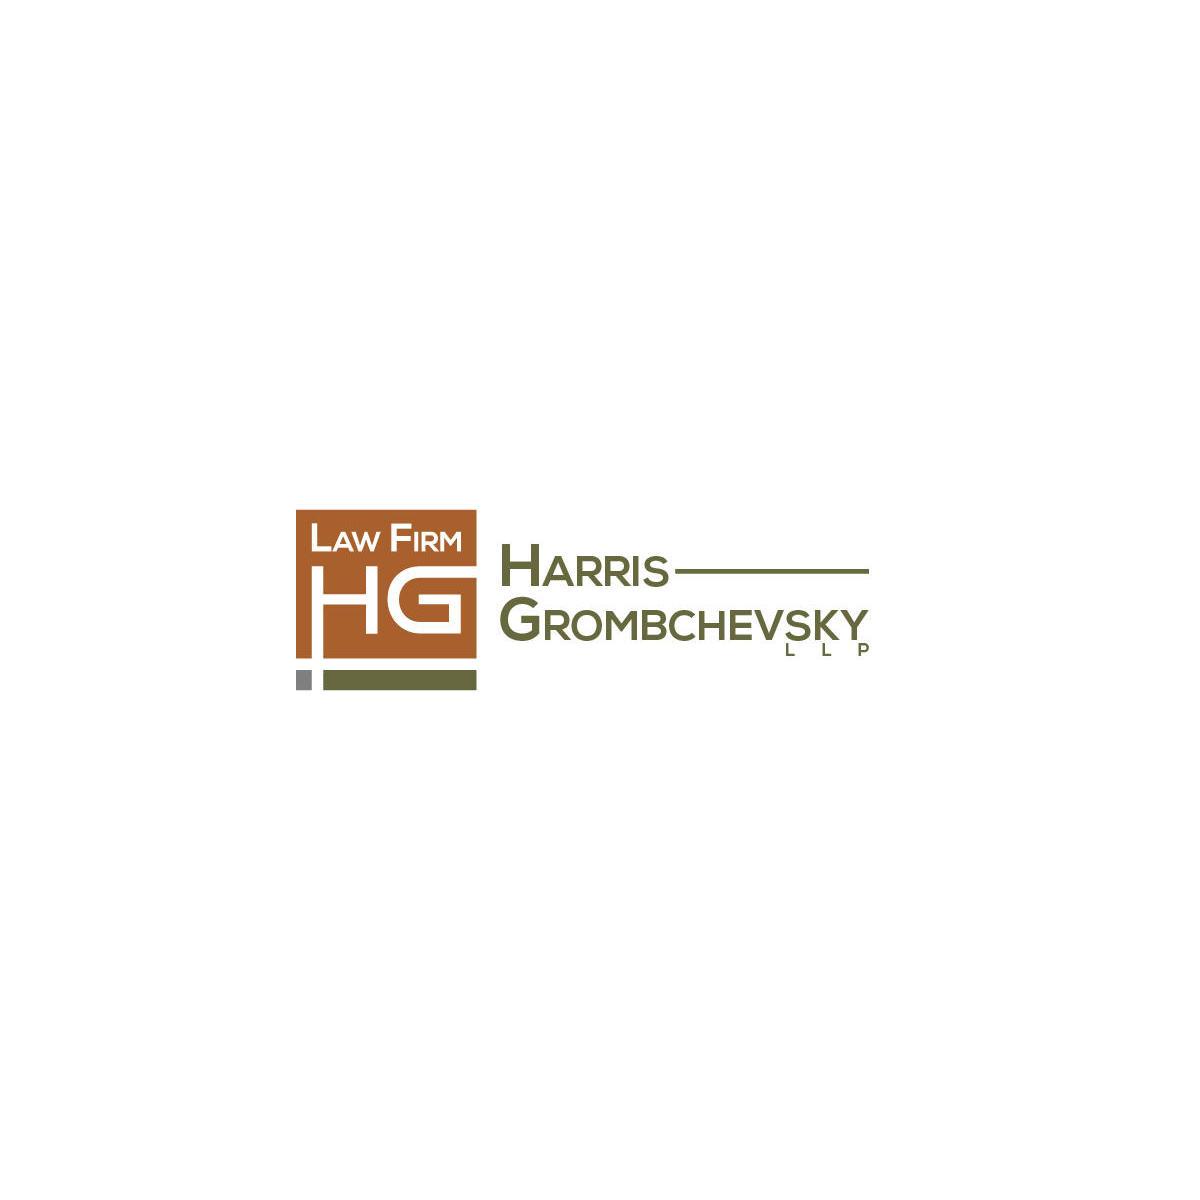 Harris Grombchevsky LLP